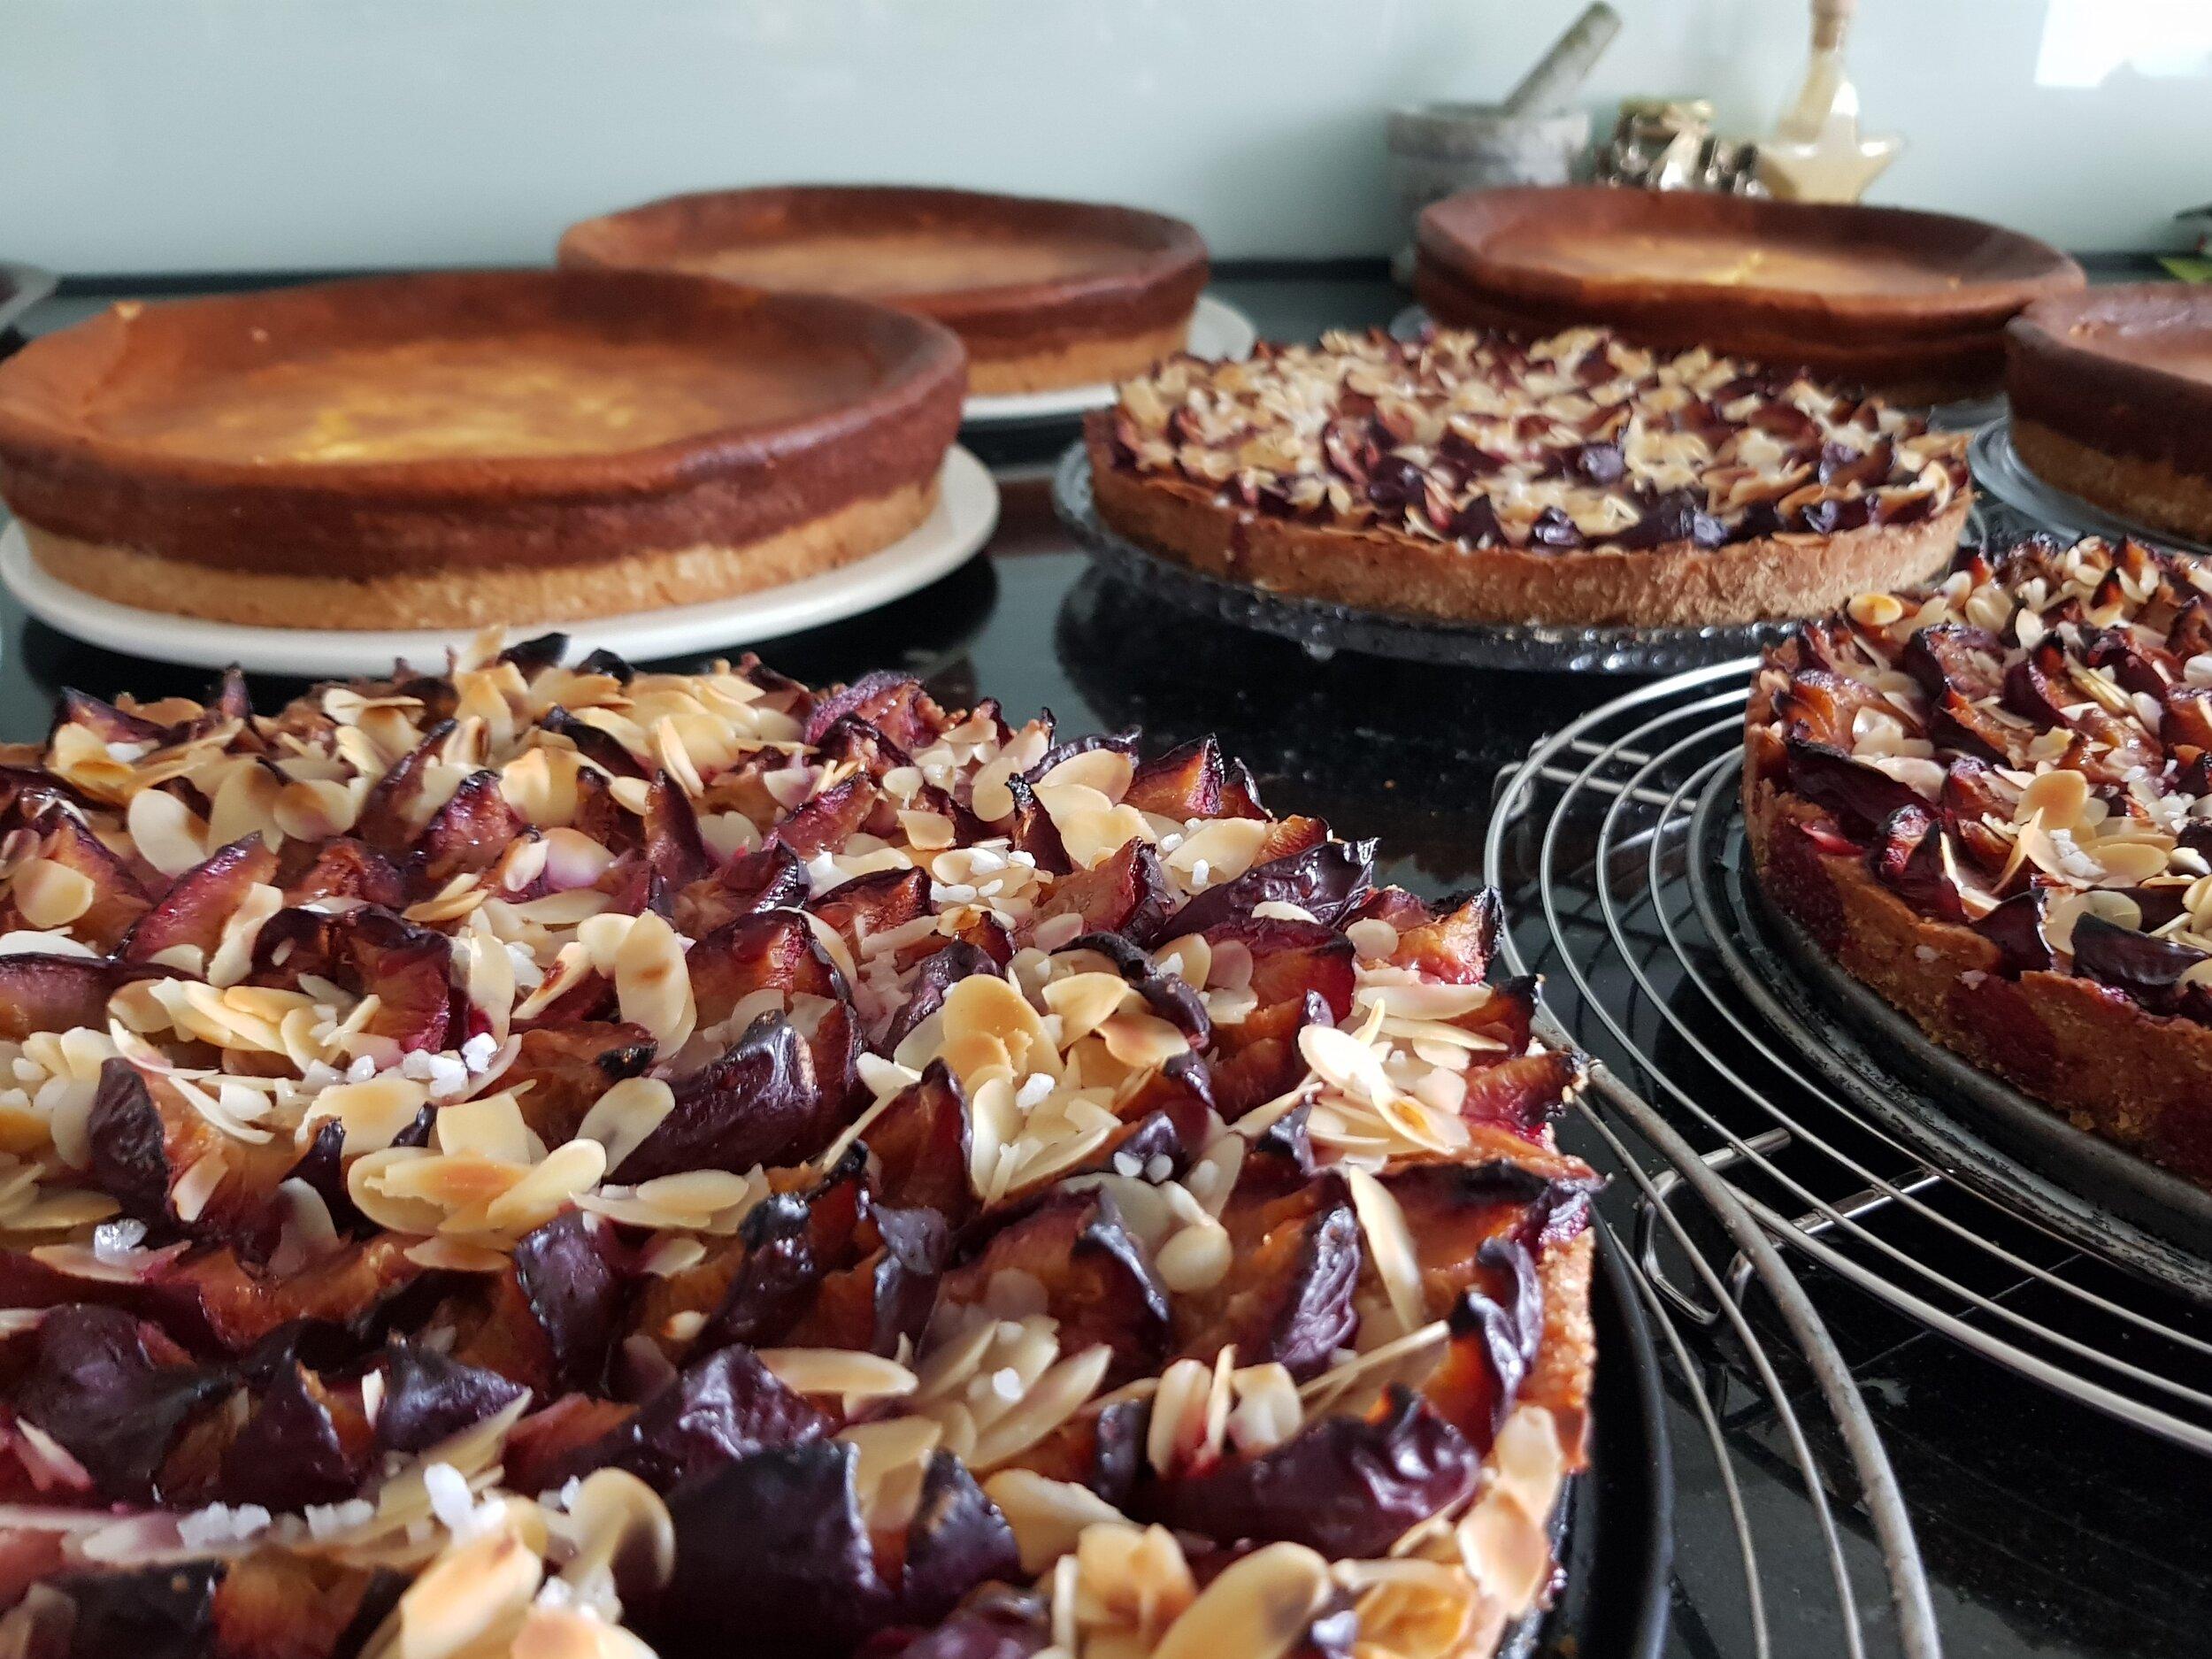 Kuchen aus der Schlossküche